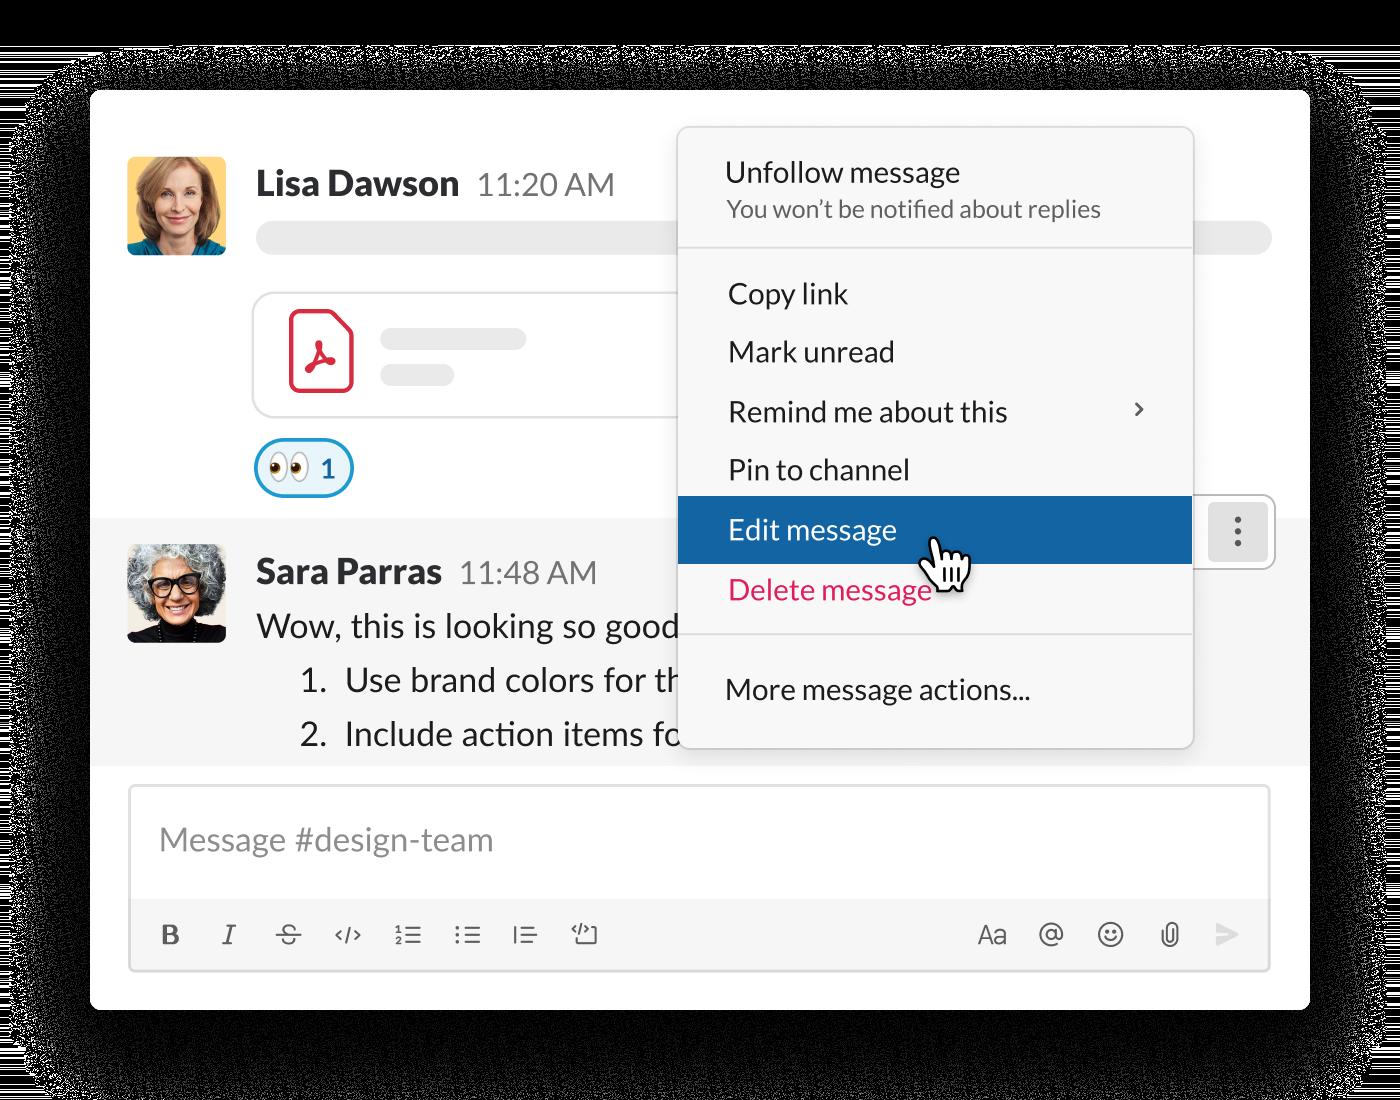 editing a sent message in a Slack conversation